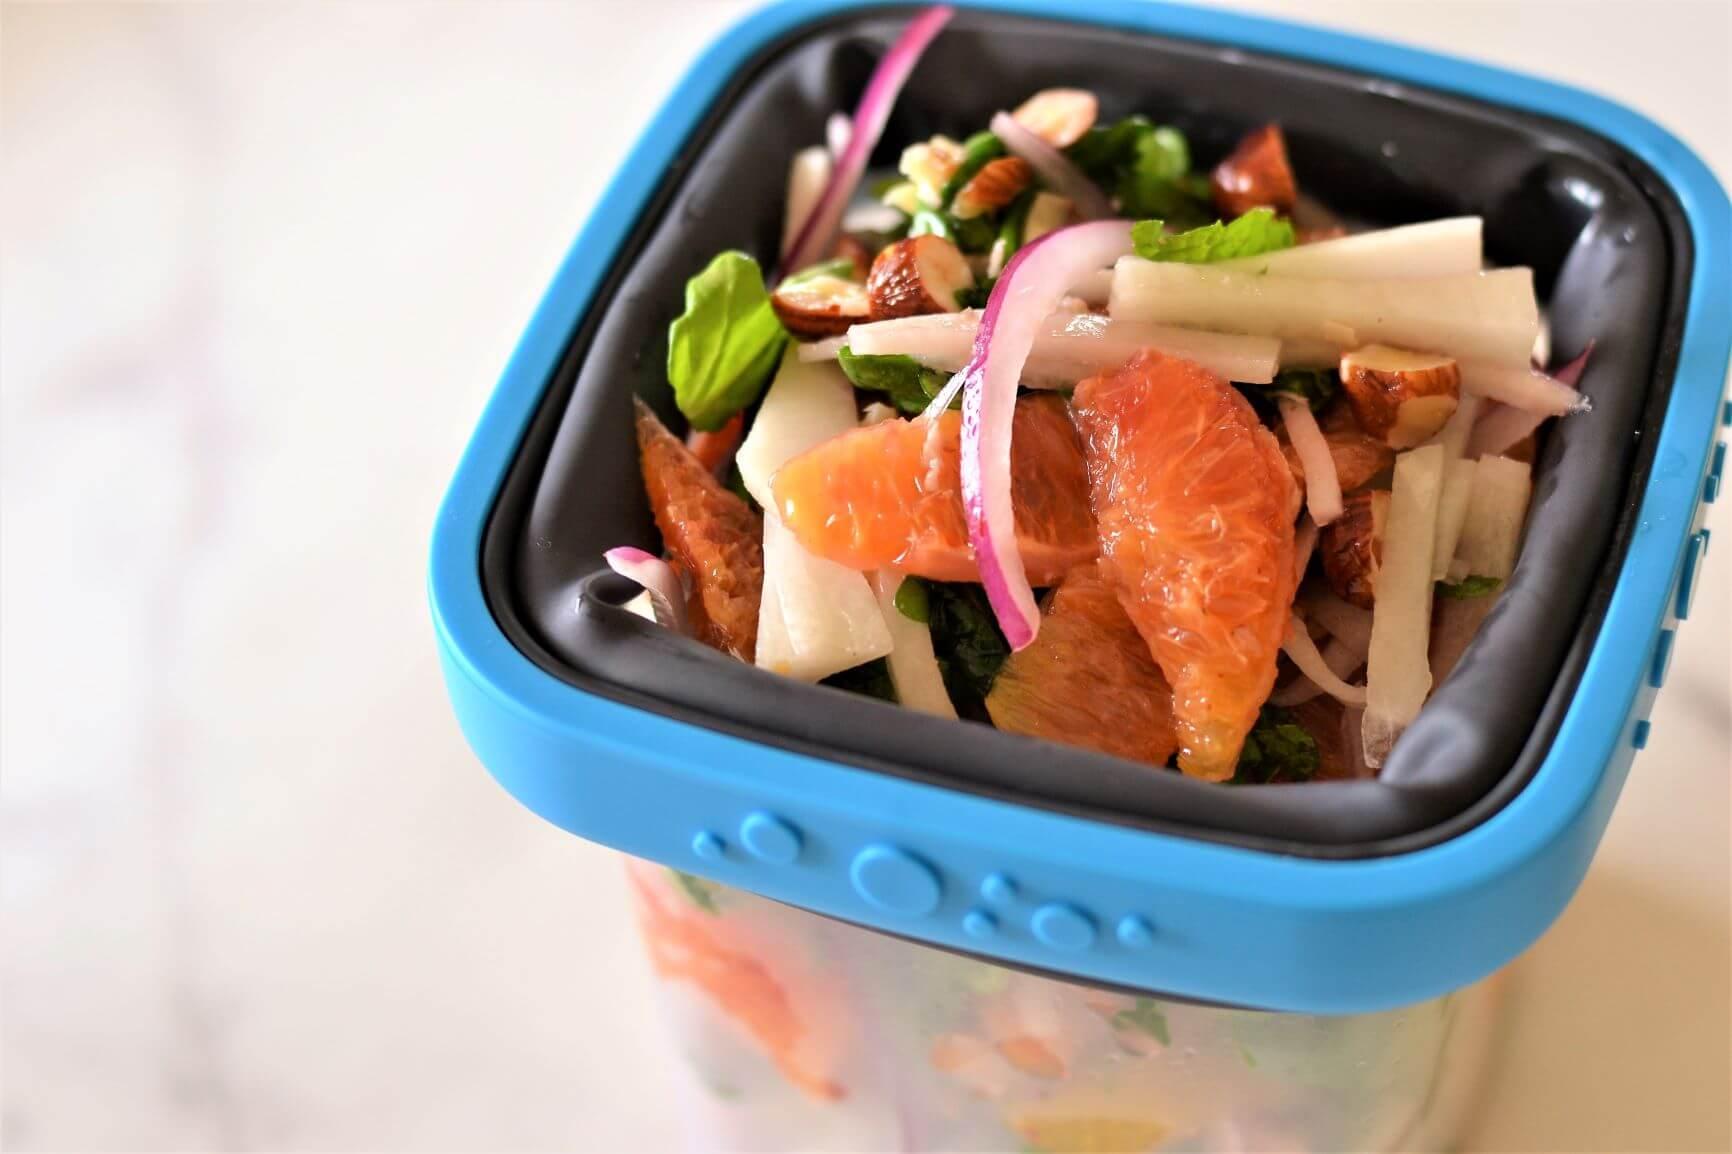 blood-orange-salad-in-bento-box